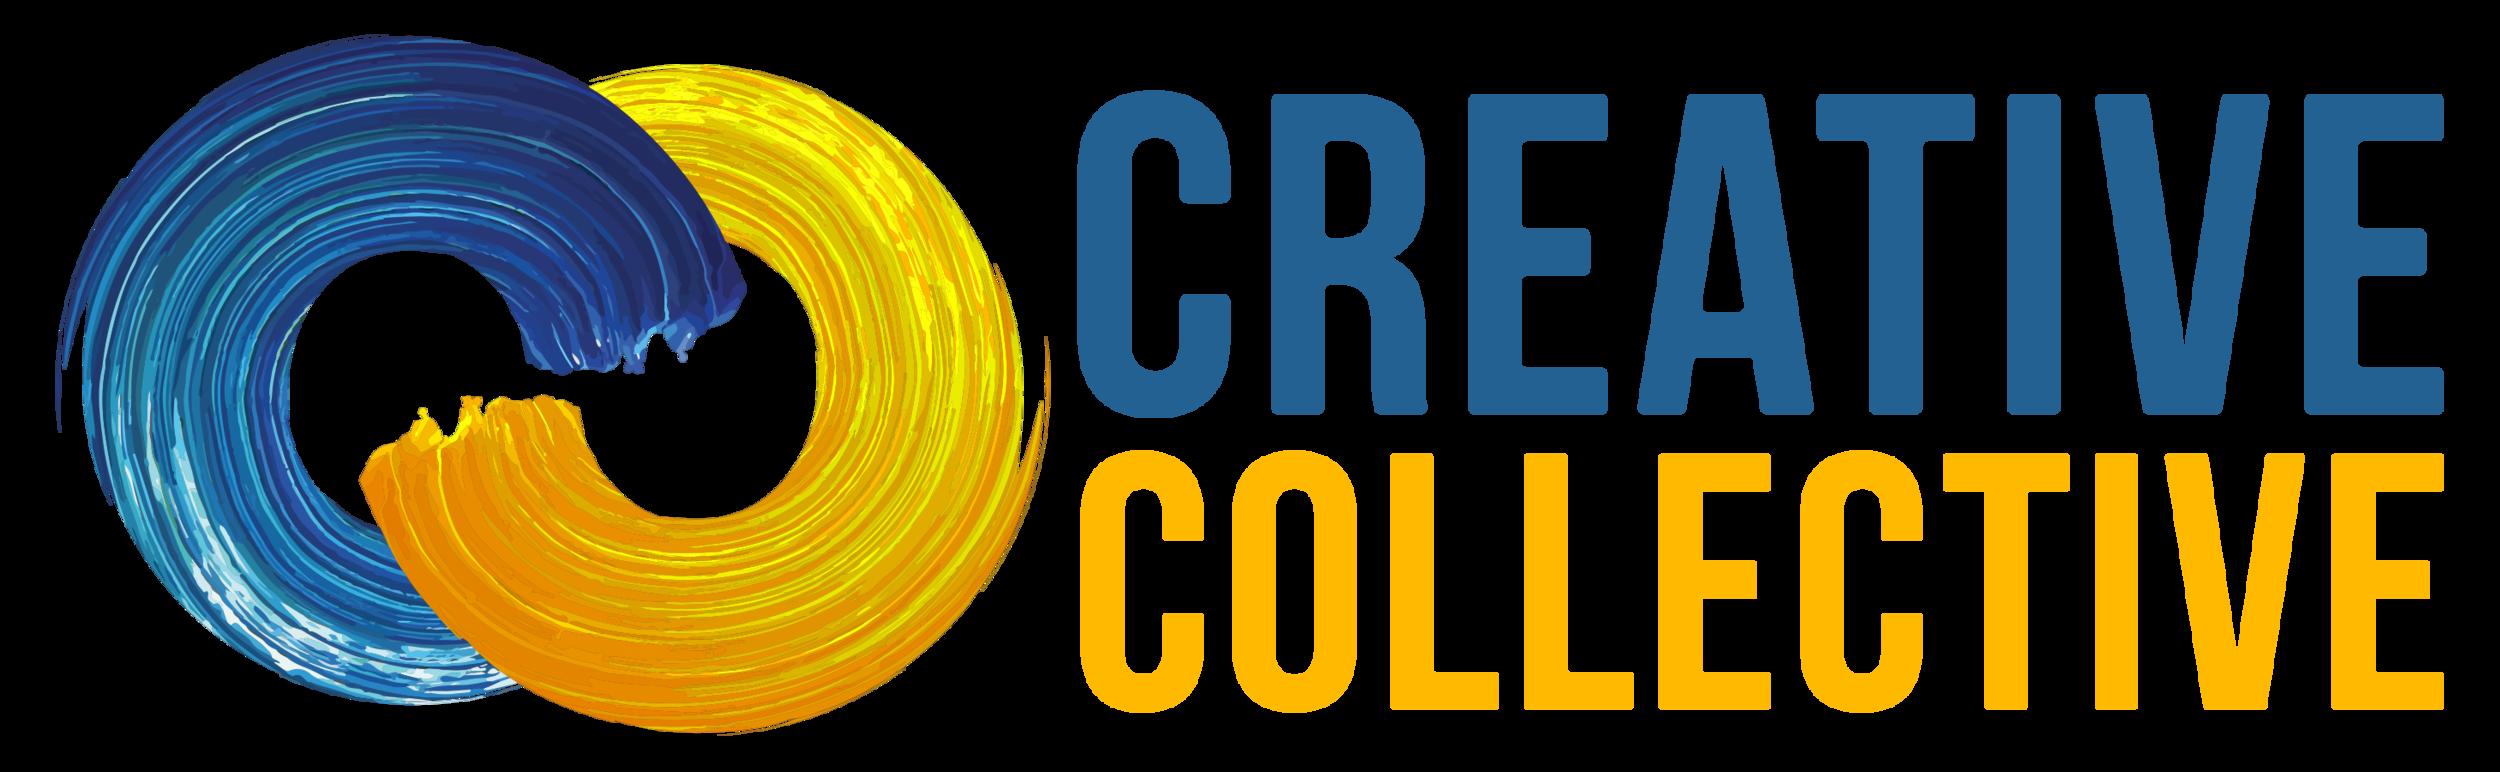 Creative Collective Logo Salem MA.png